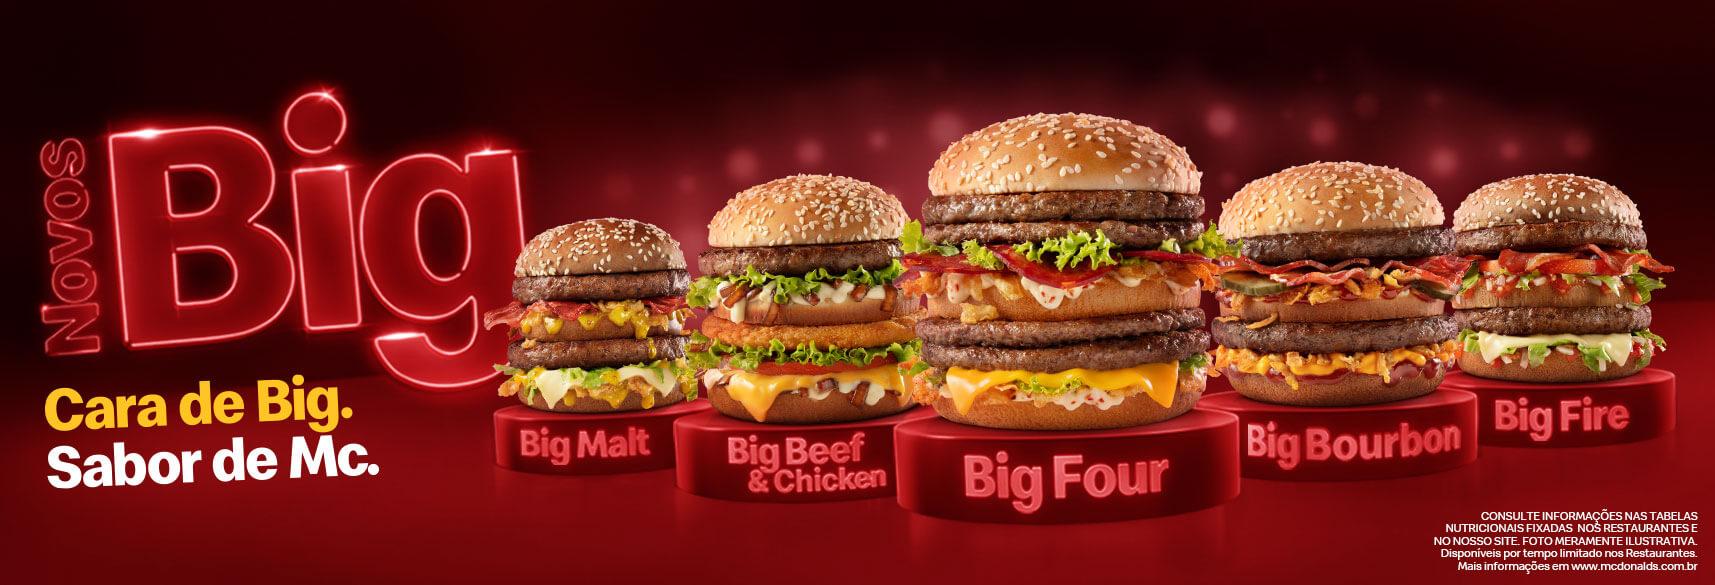 McDonald's Brazil Big New